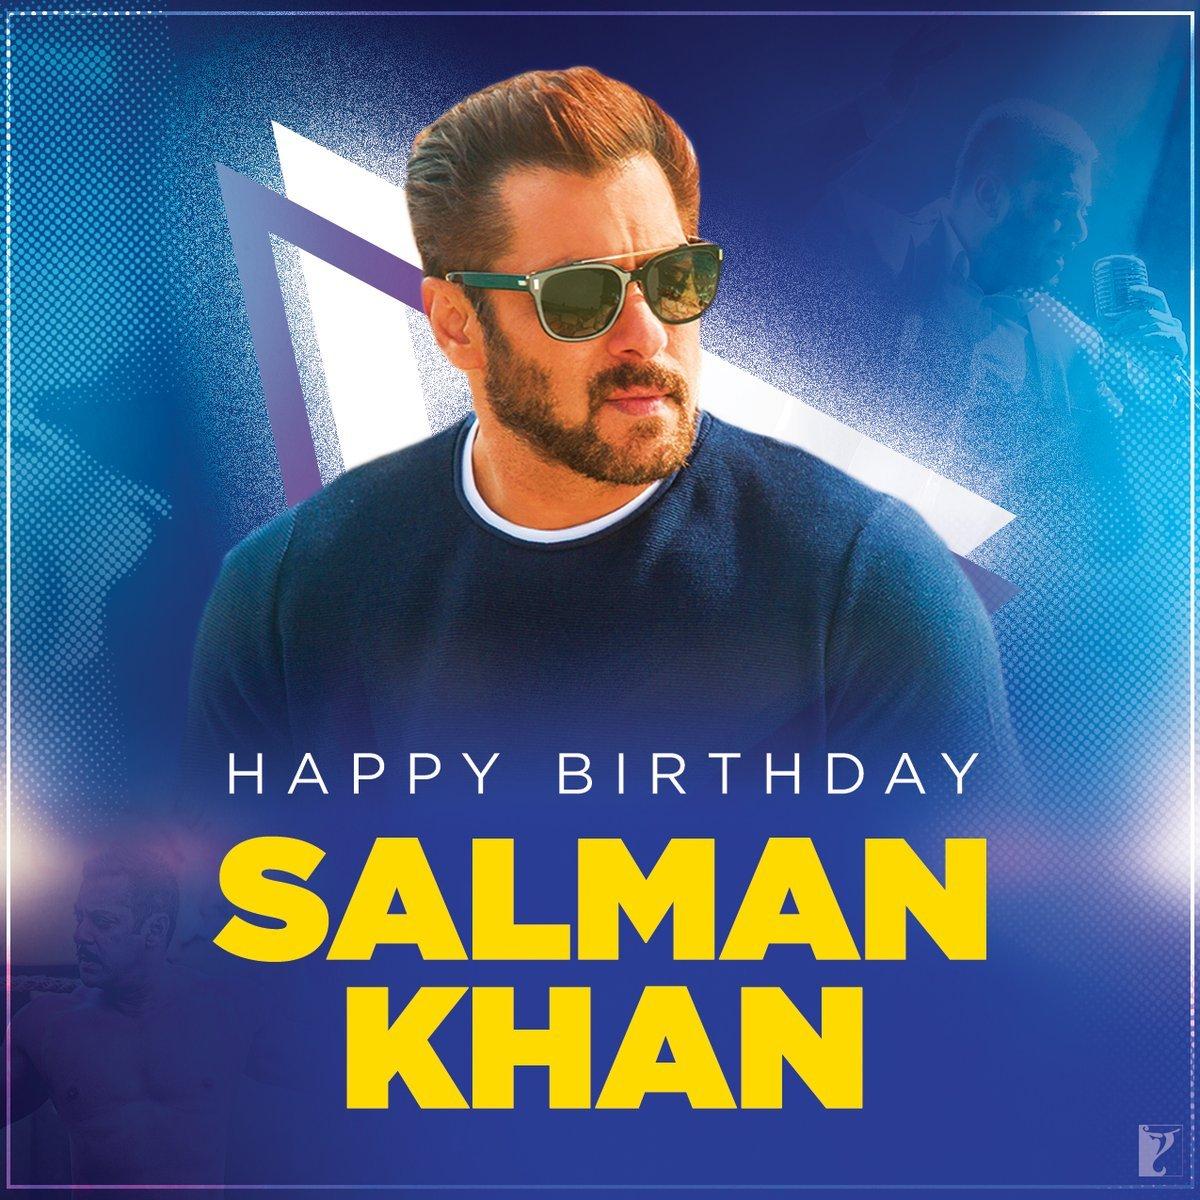 salman khan birthday images download